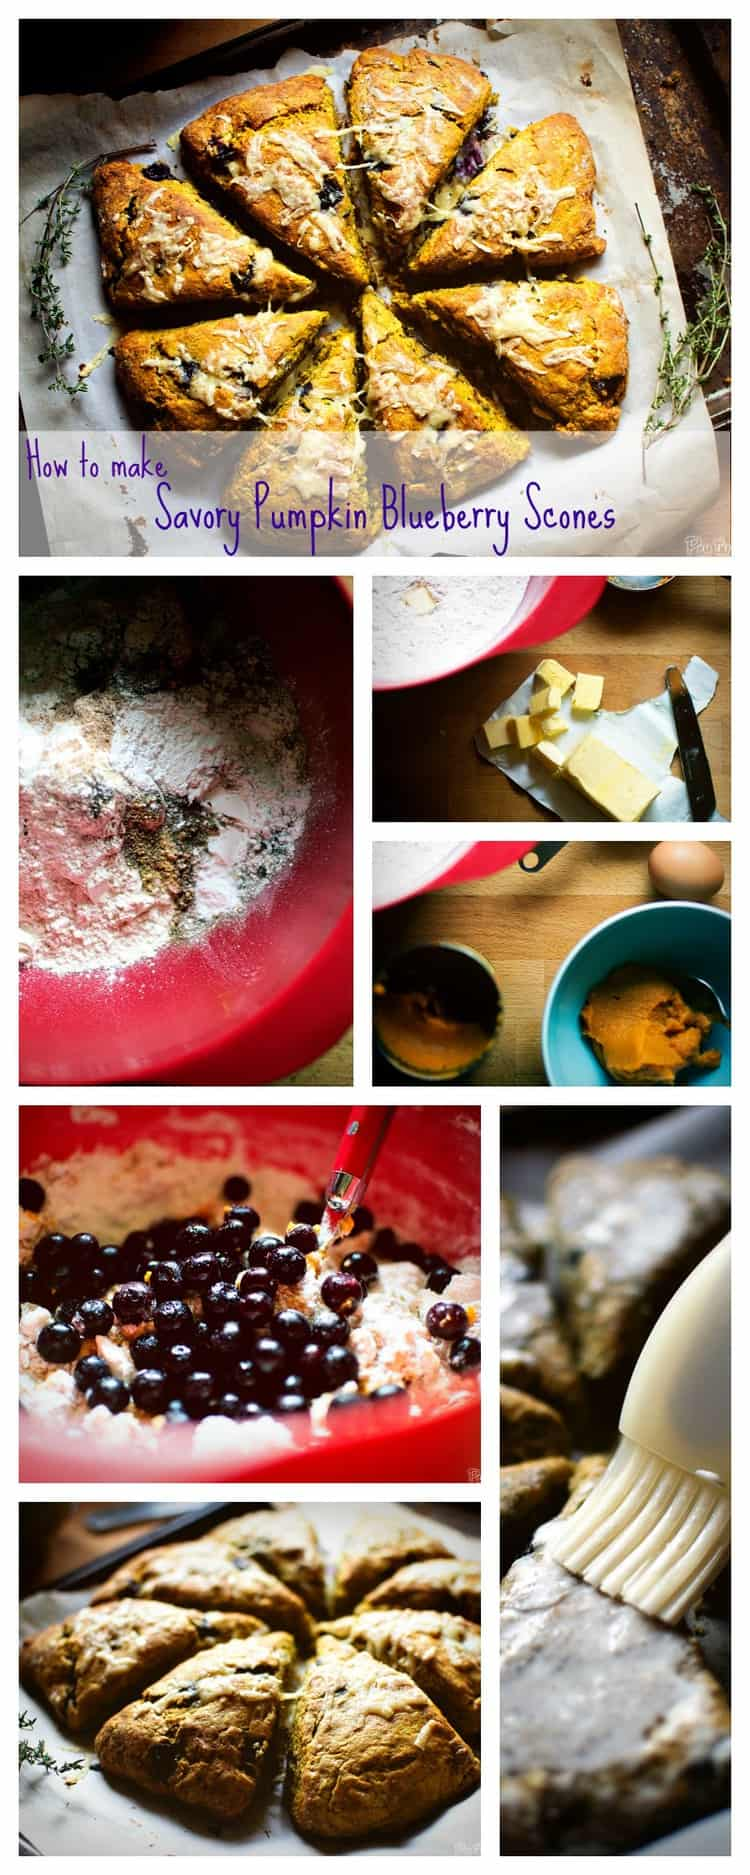 how-to-make-pumpkin-scones